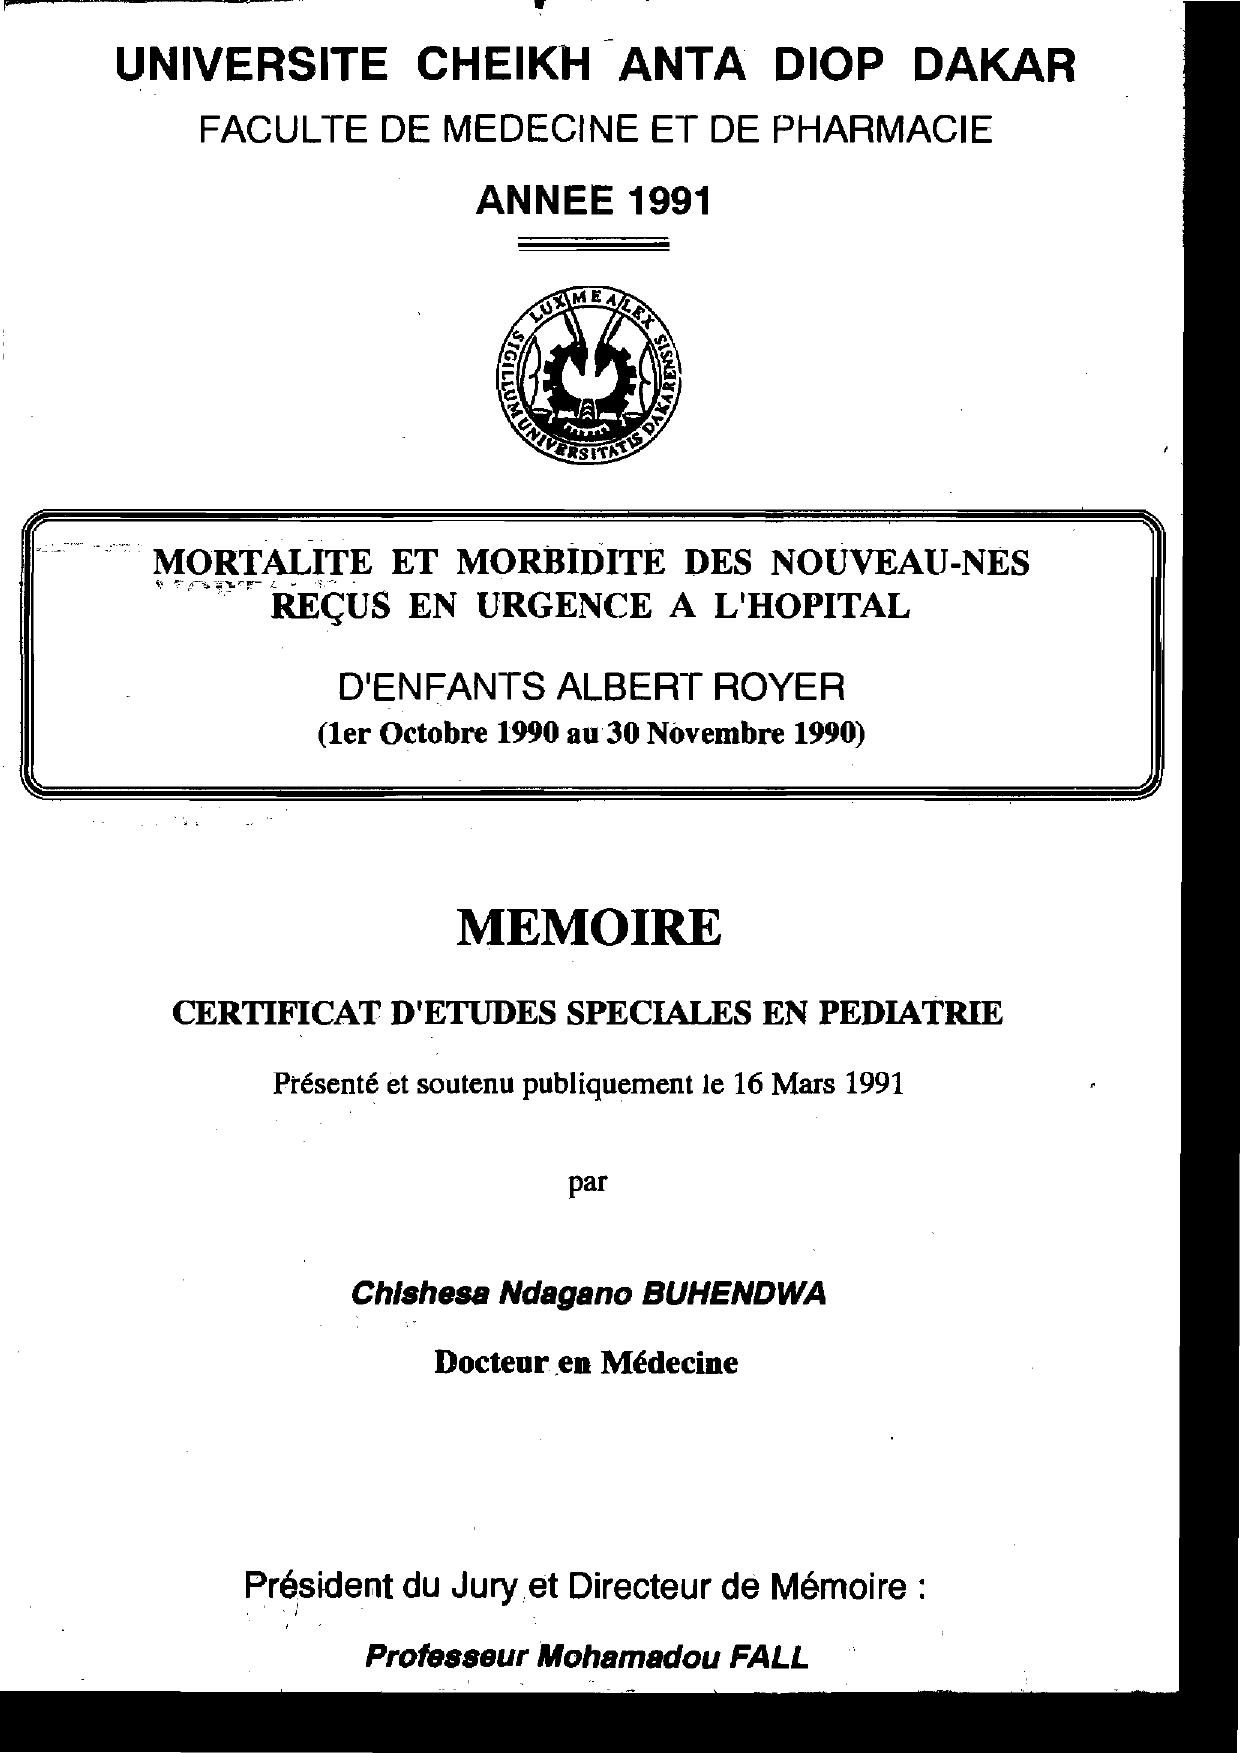 MortaliteMorbidite_nveau_nes.pdf